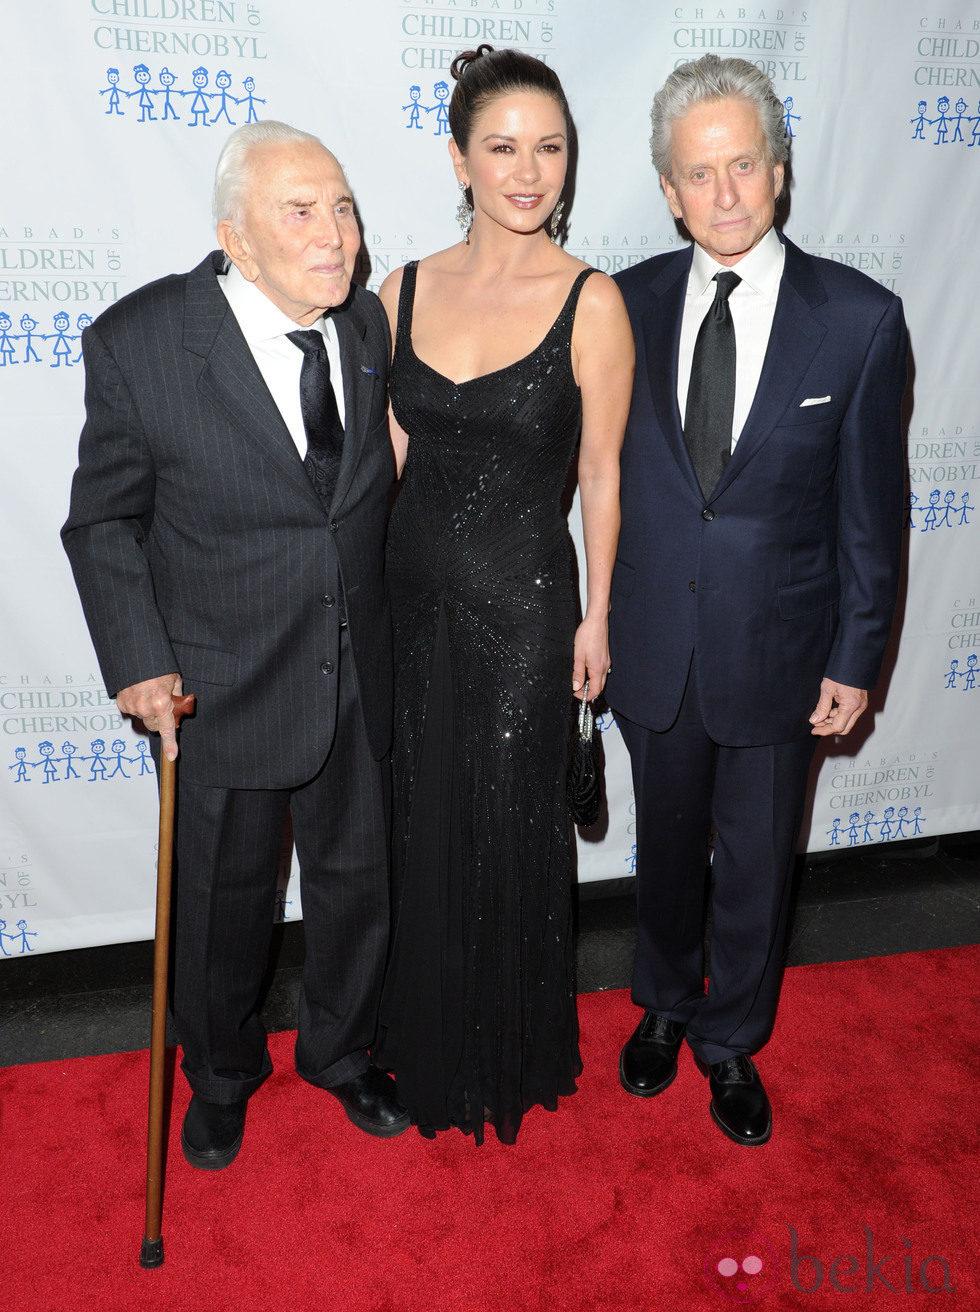 Kirk Douglas, Catherine Zeta Jones y Michael Douglas en la gala 'Children at heart'